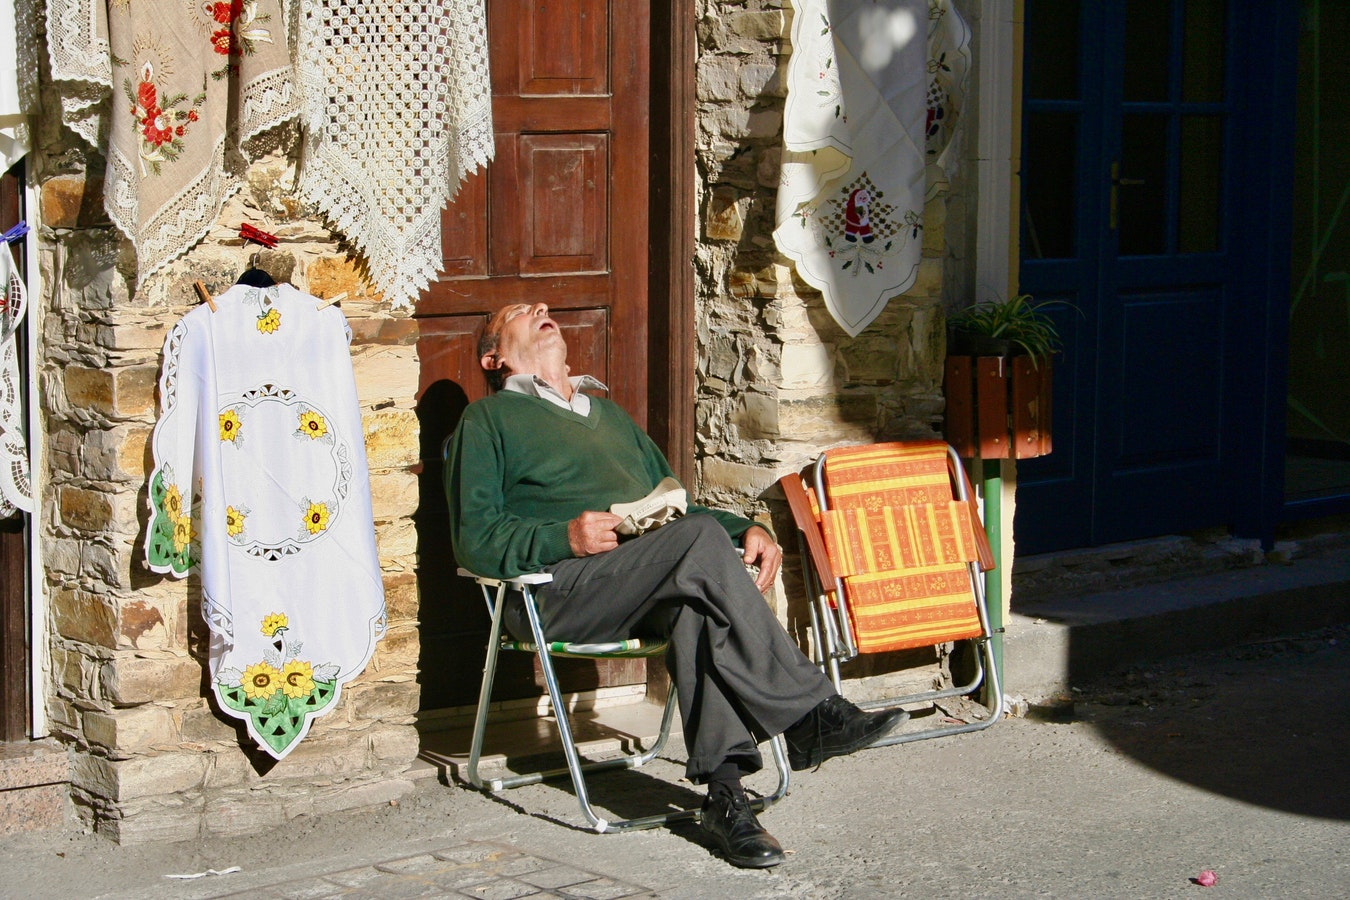 A man sleeping in a chair on the street. Sleep apnea can cause excessive fatigue.